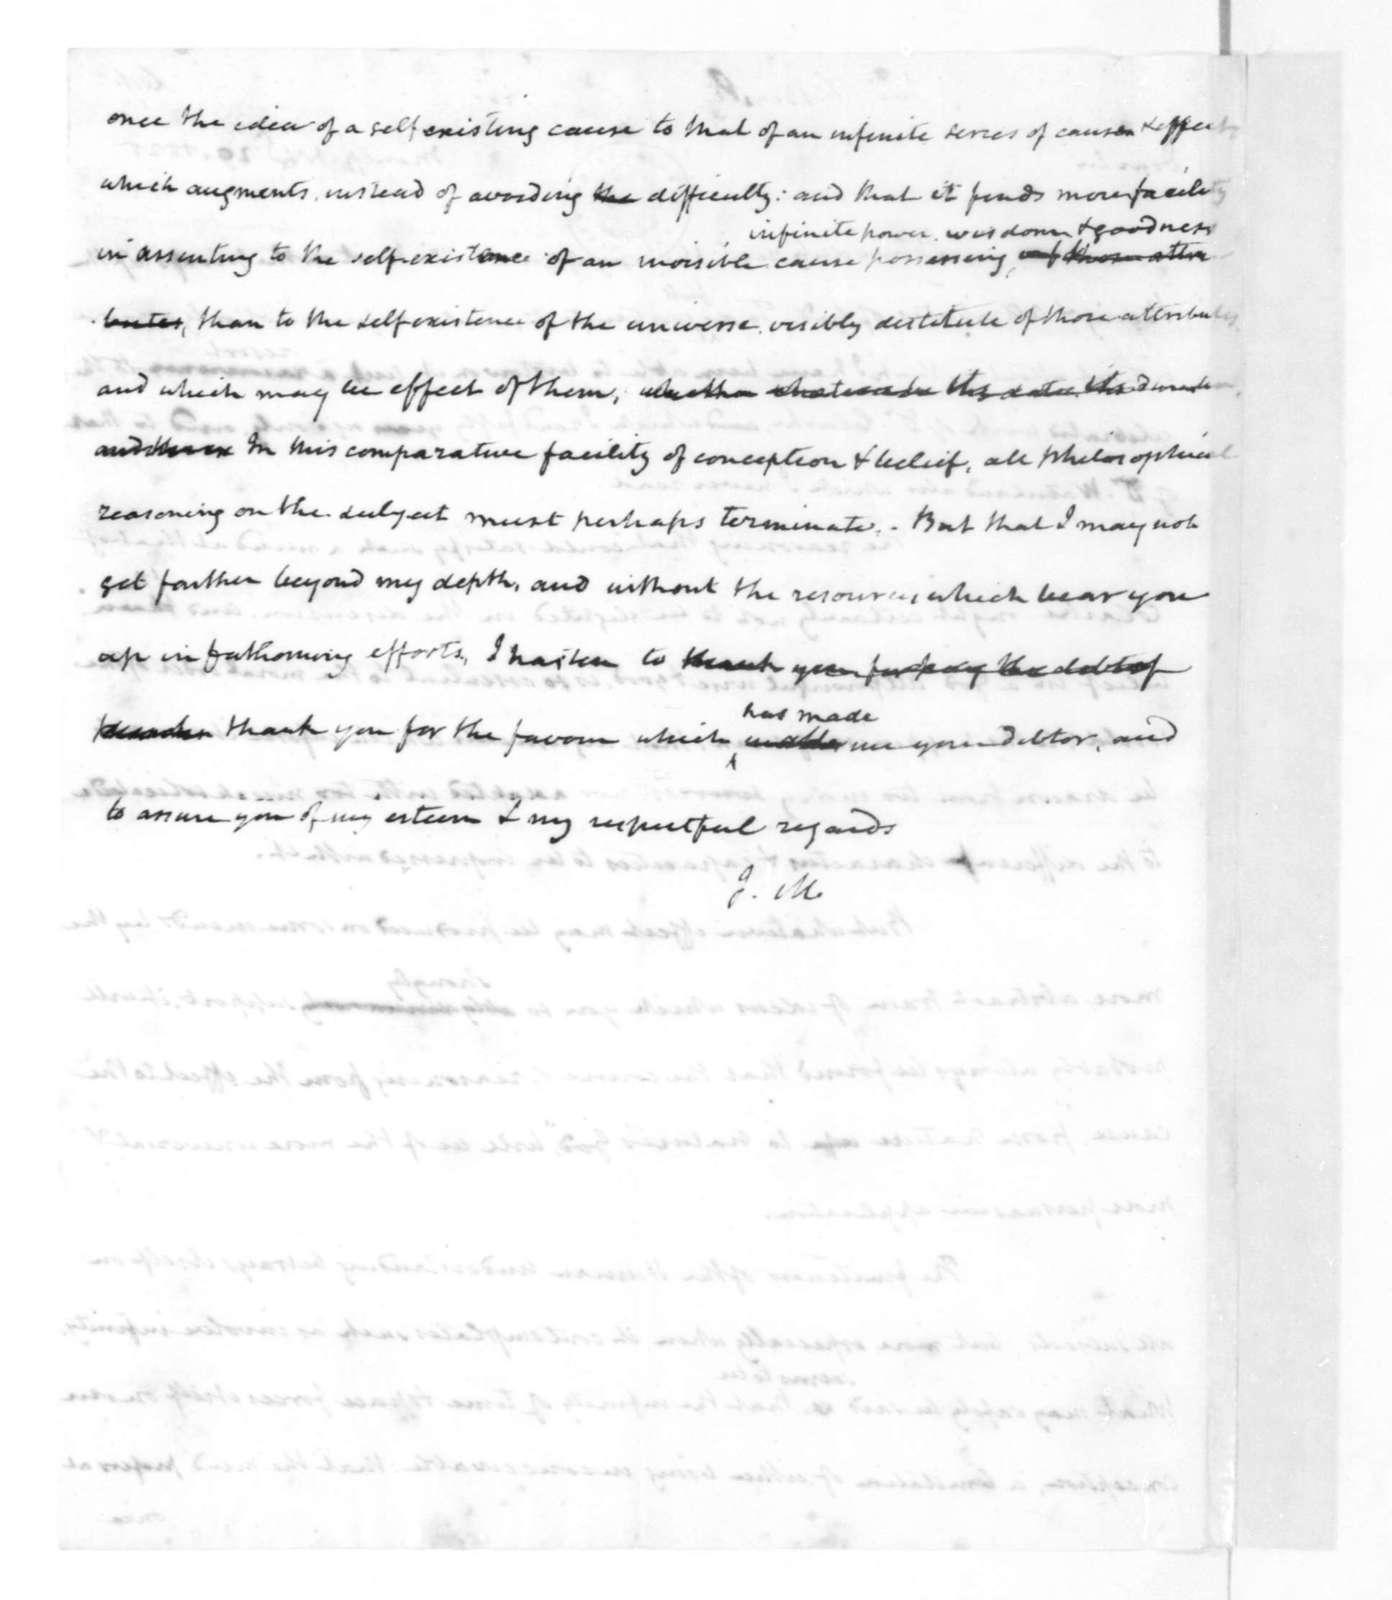 James Madison to F. Beasley, November 20, 1825.